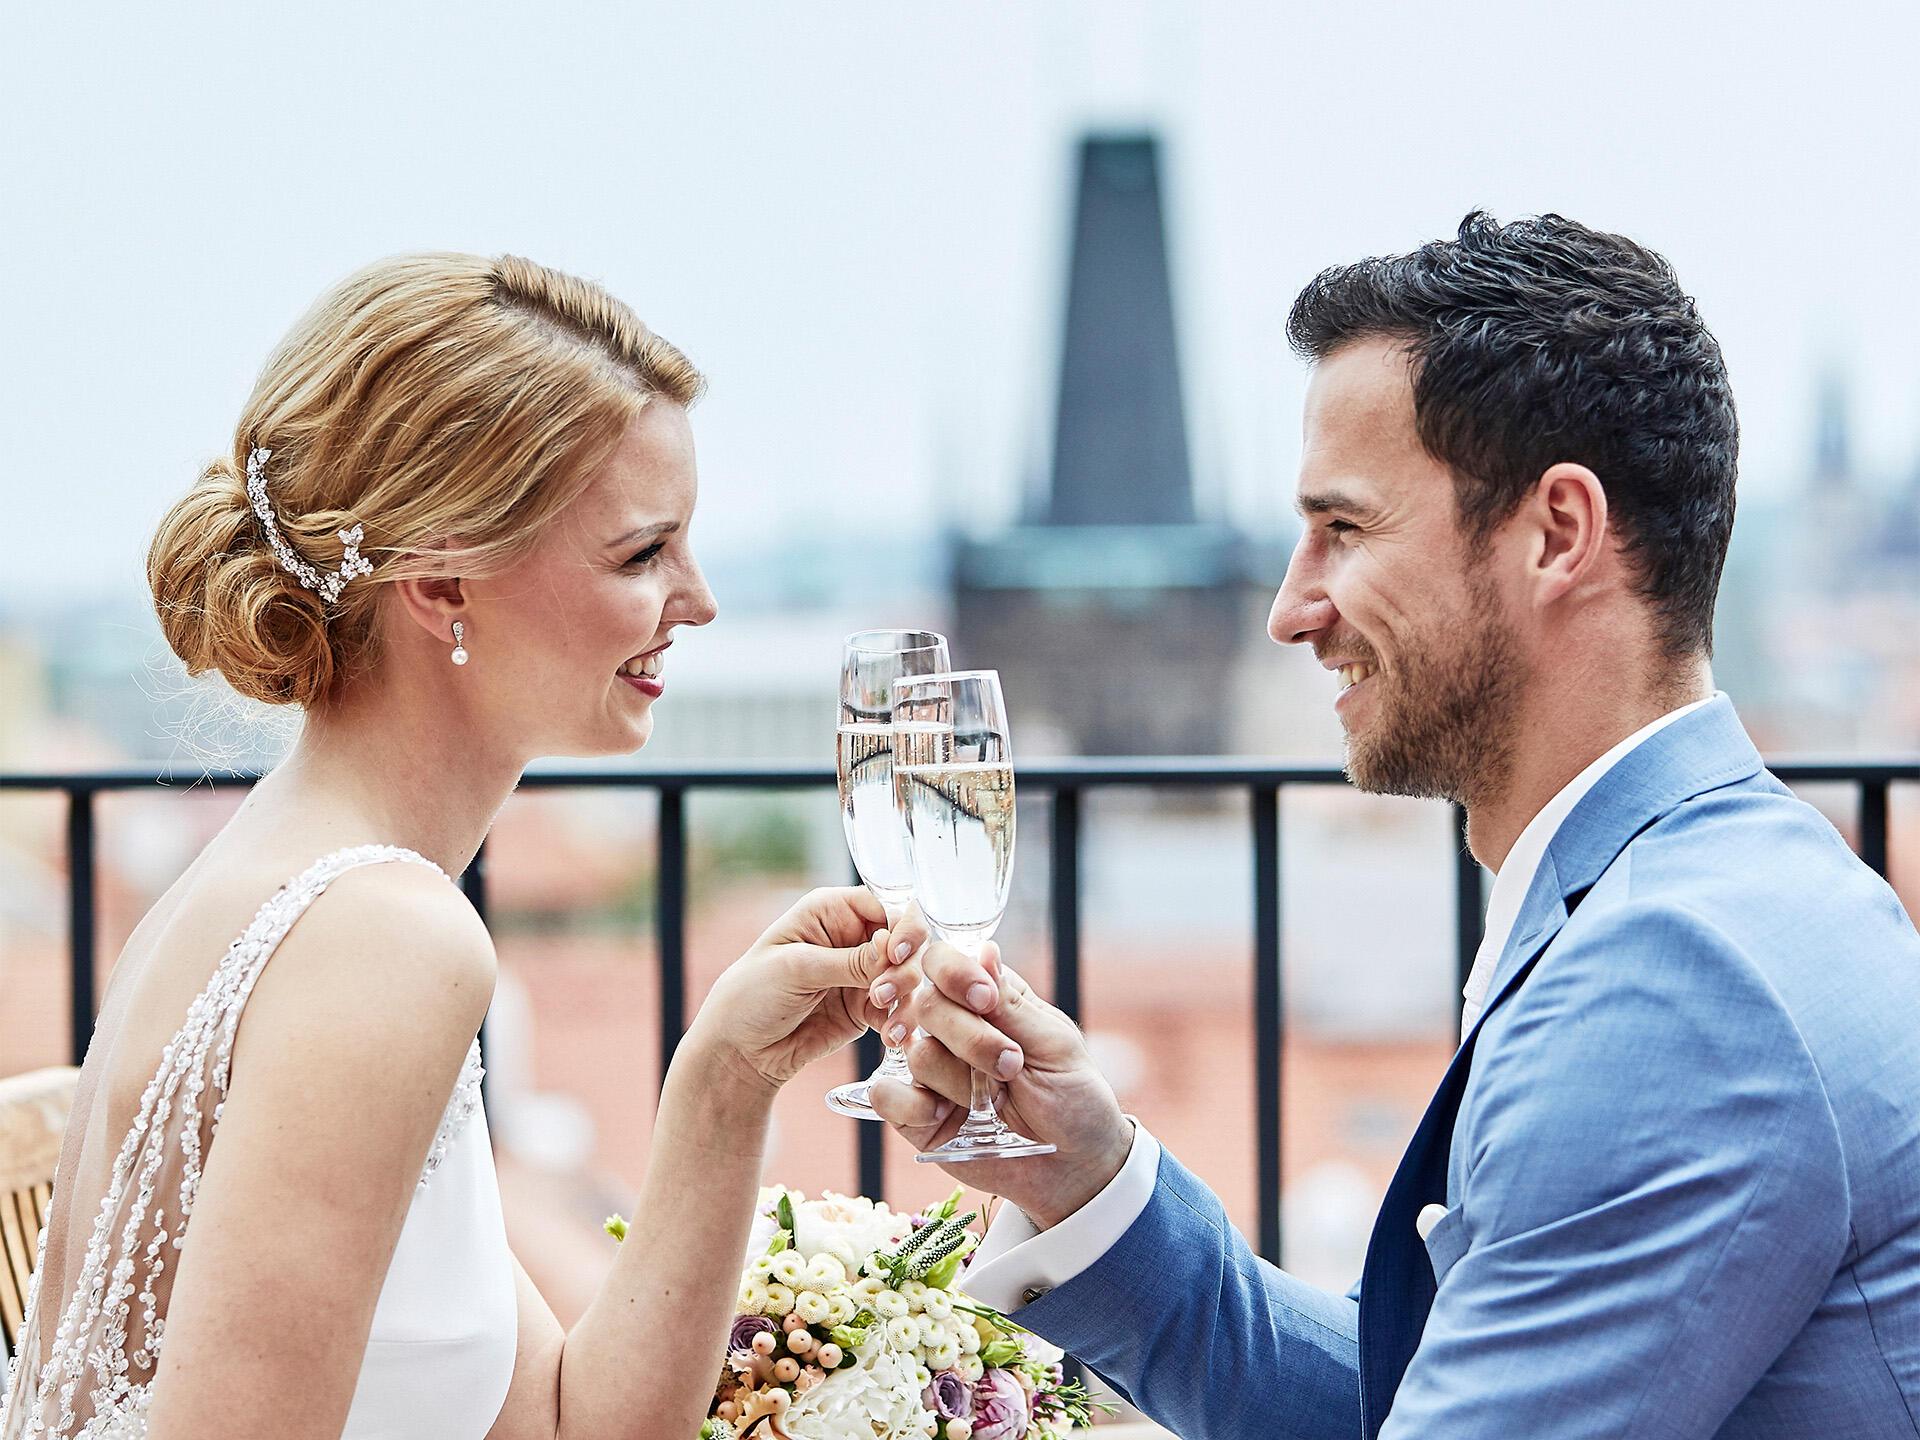 Wedding Menus at Aria Hotel in Prague